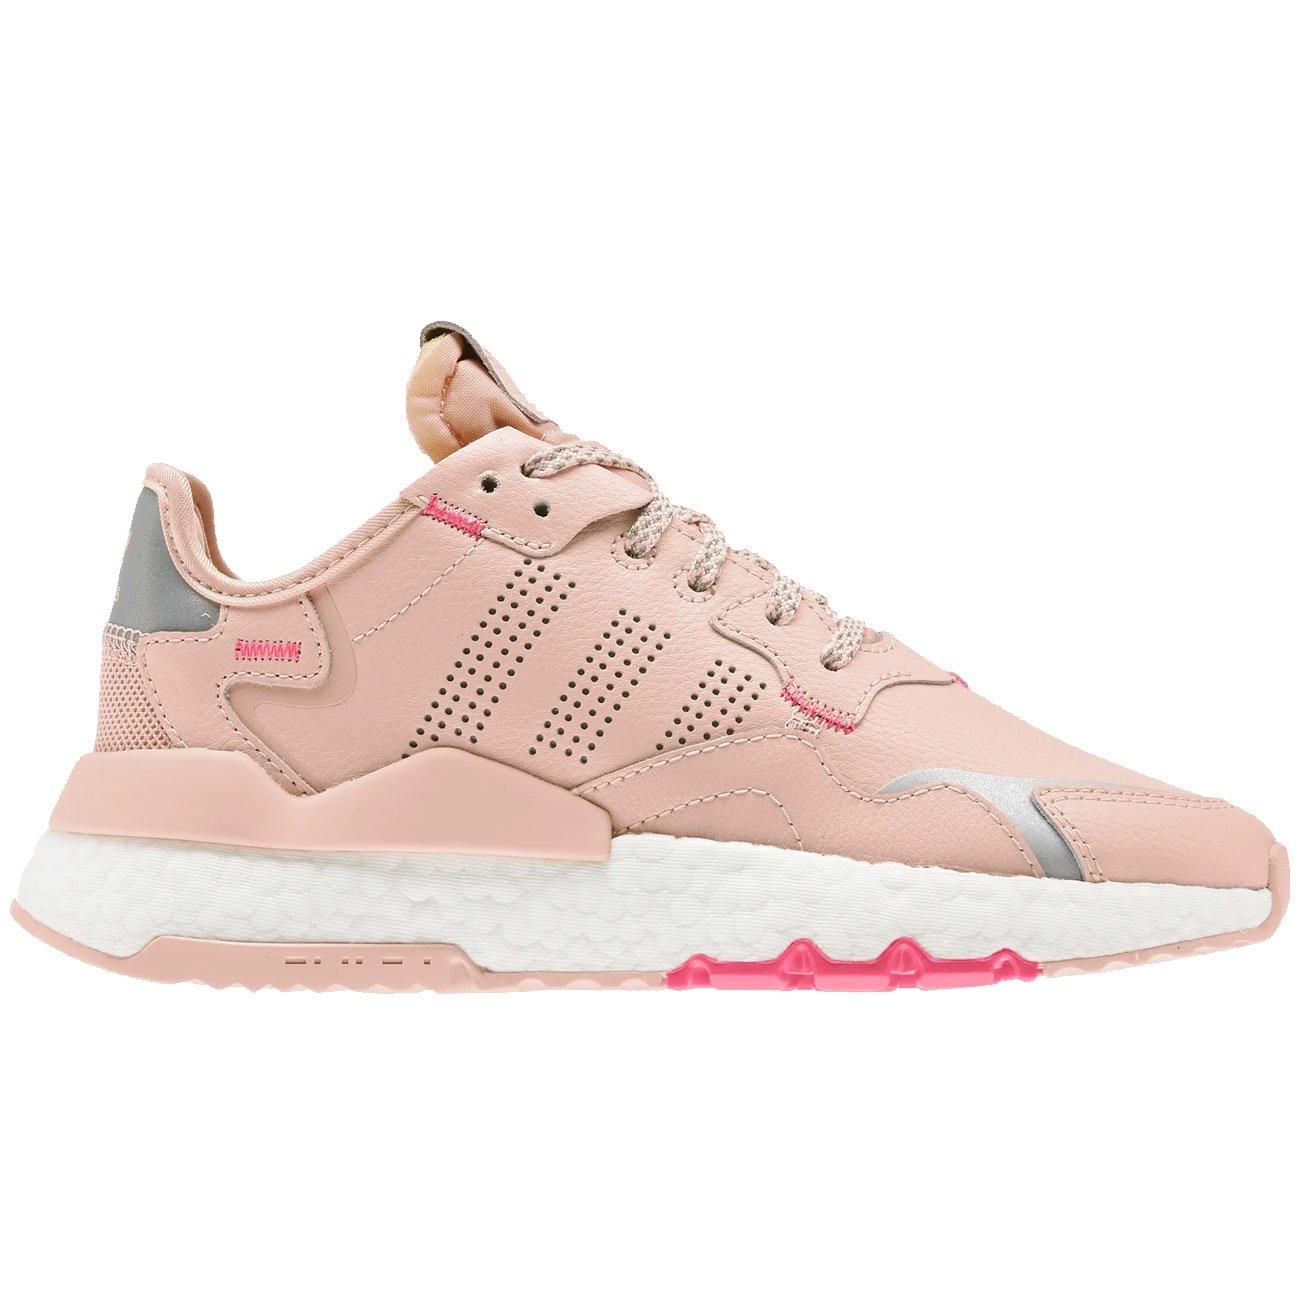 adidas Nite Jogger Sneakers Pink